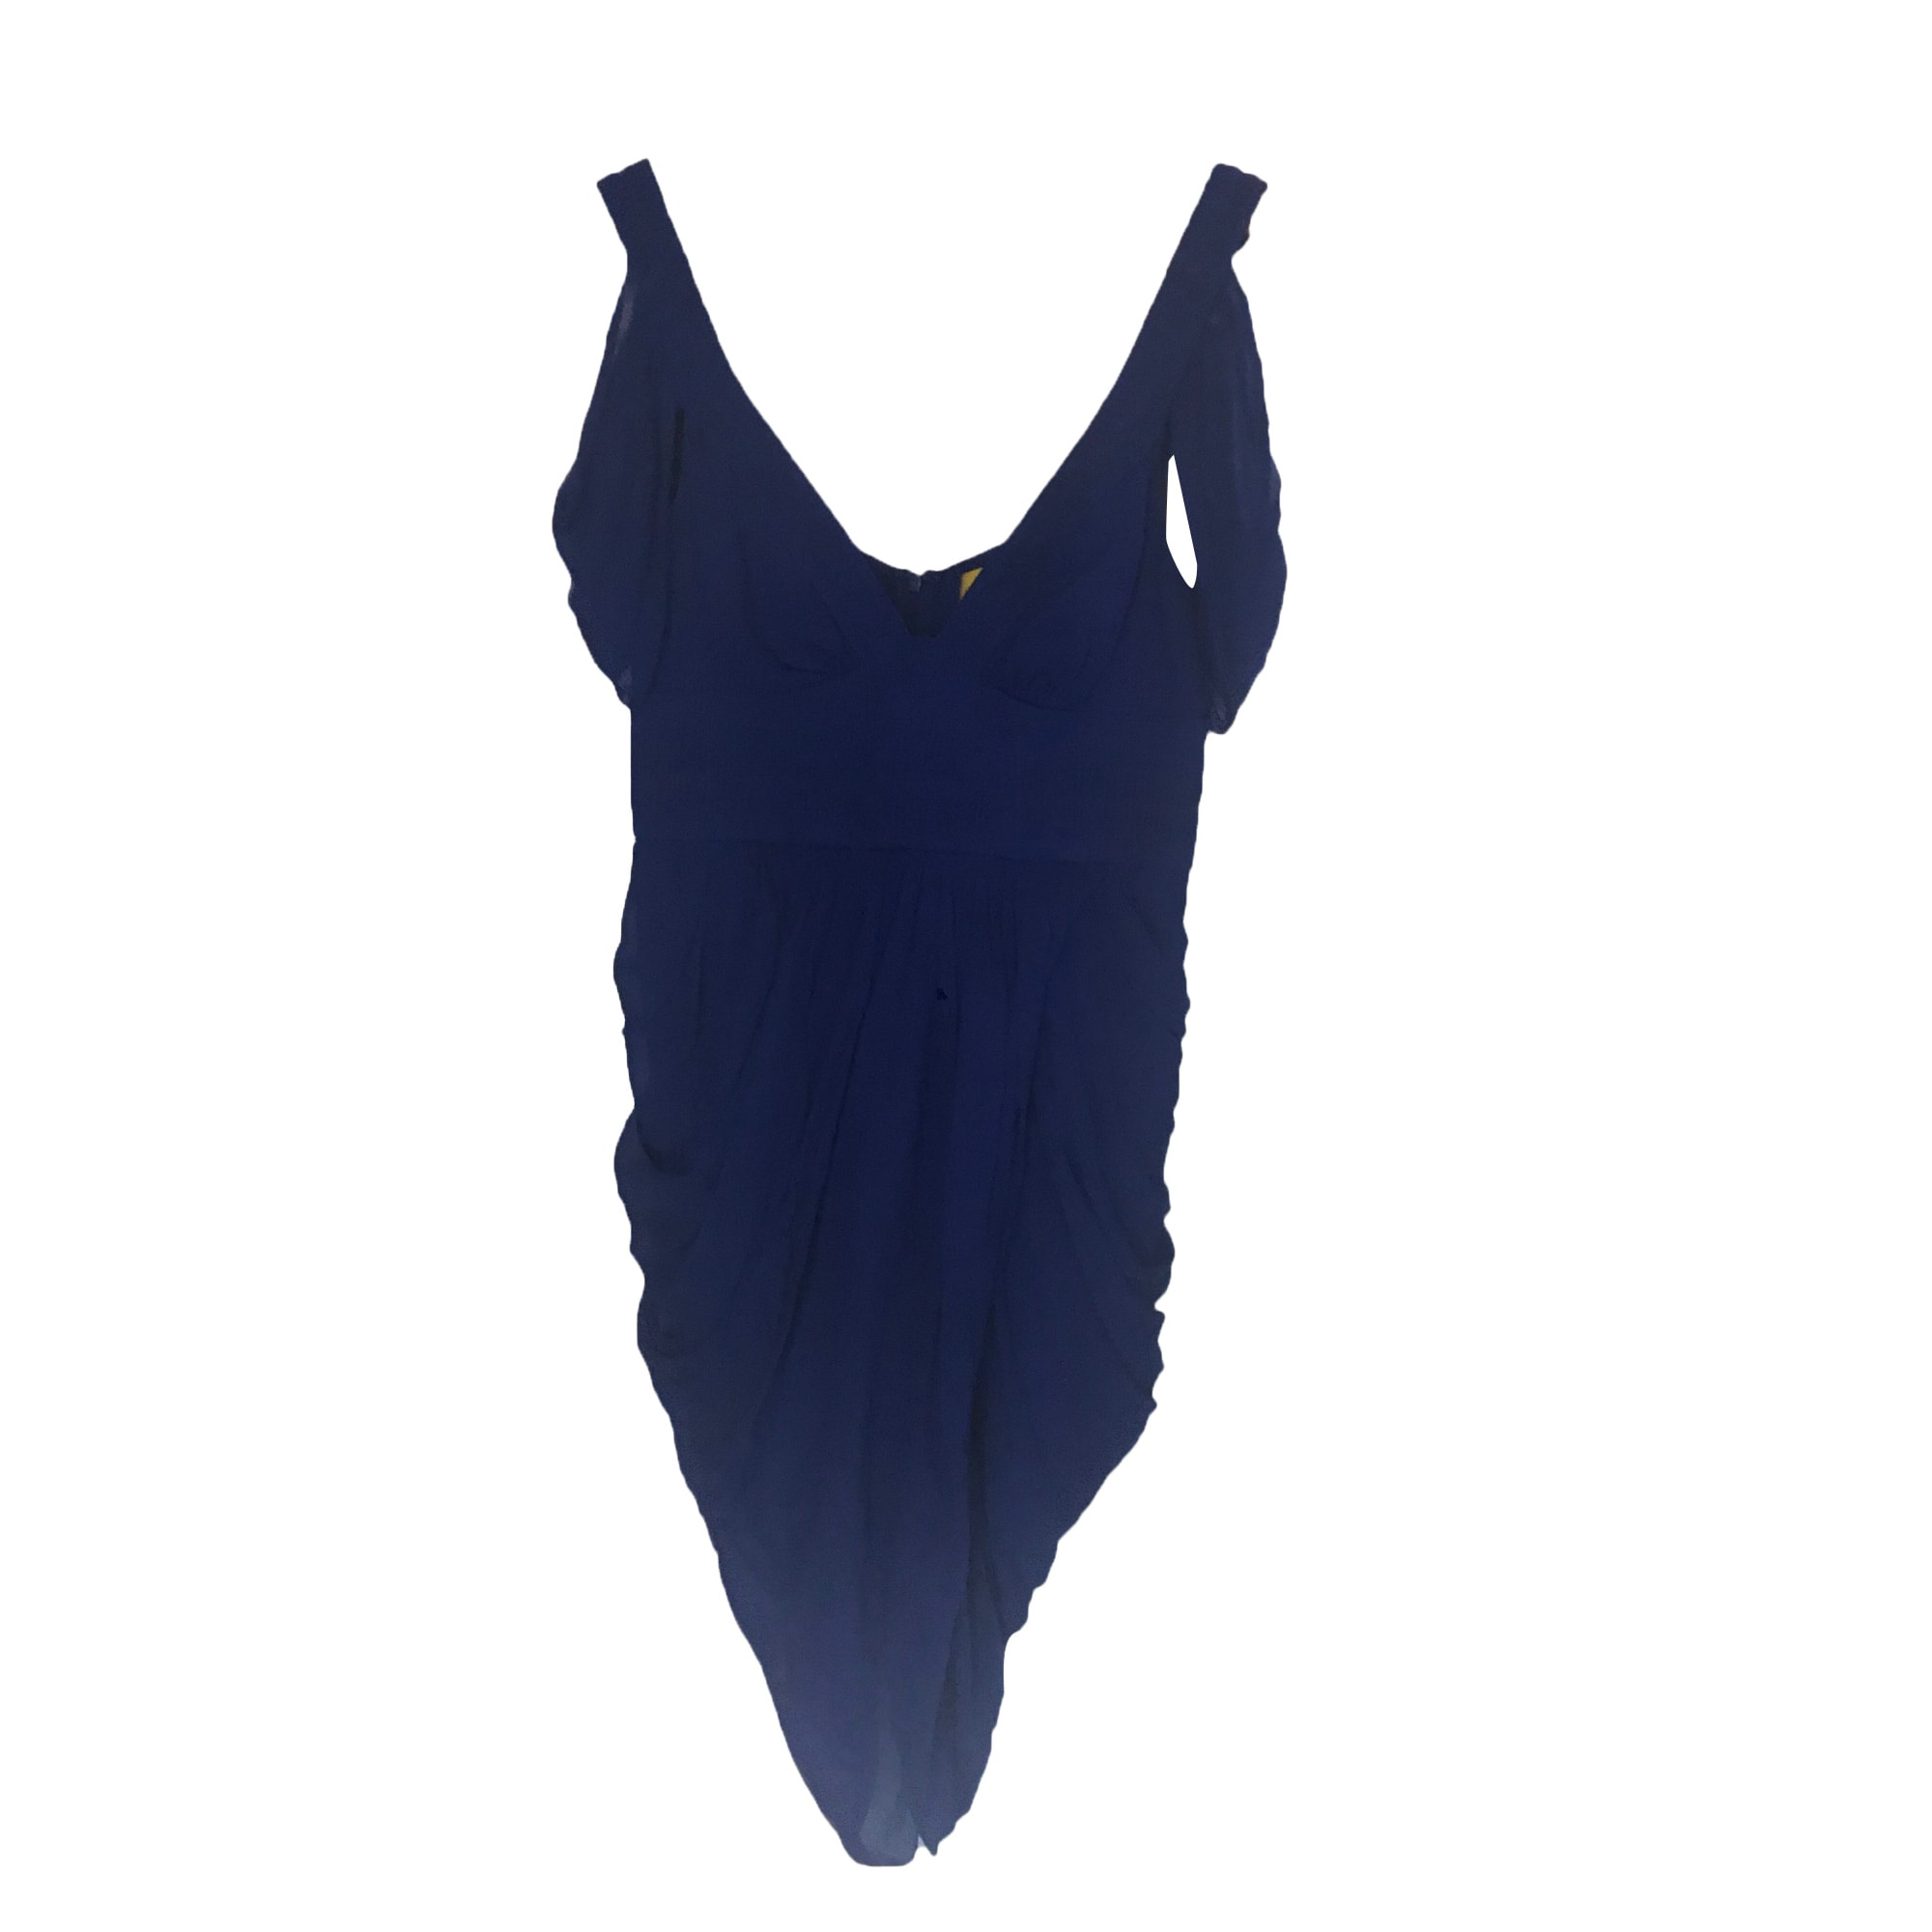 Robe courte CATHERINE MALANDRINO Bleu, bleu marine, bleu turquoise